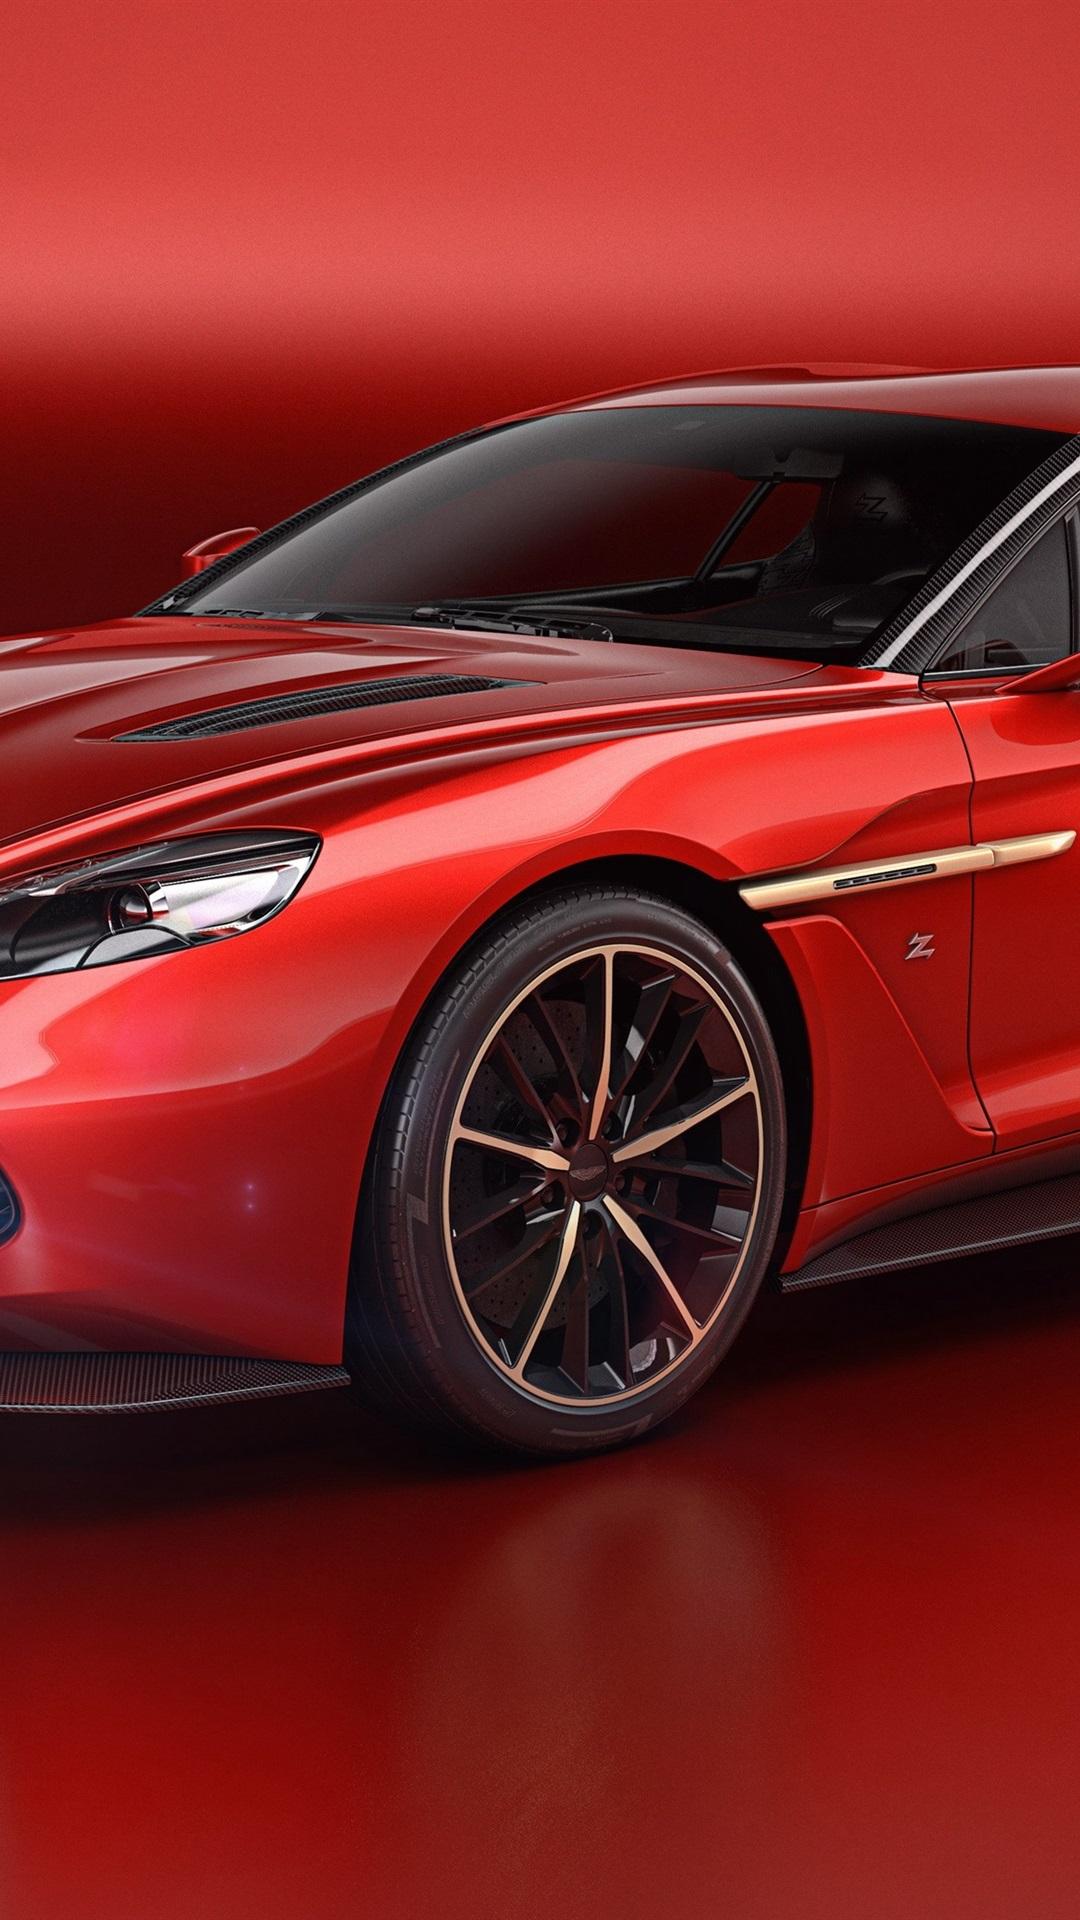 Aston Martin Vanquish Zagato Red Supercar Iphone X